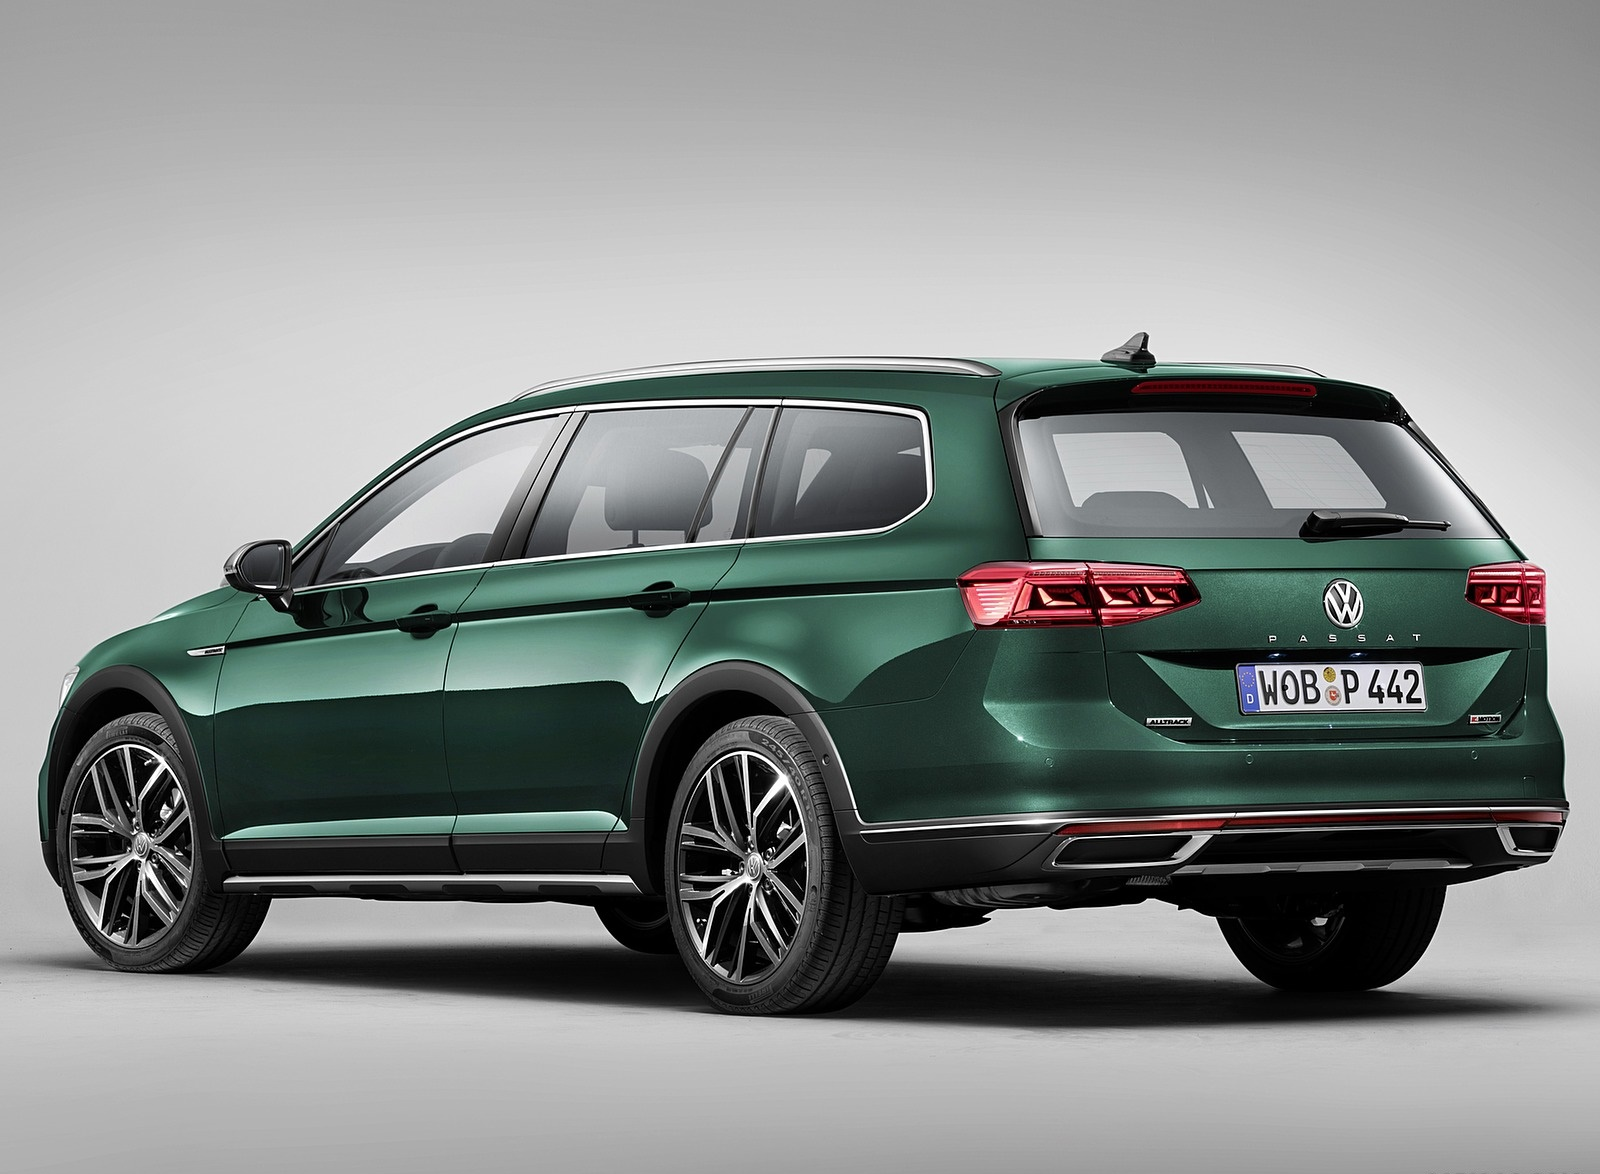 2020 Volkswagen Passat Alltrack (EU-Spec) Rear Three-Quarter Wallpapers (8)